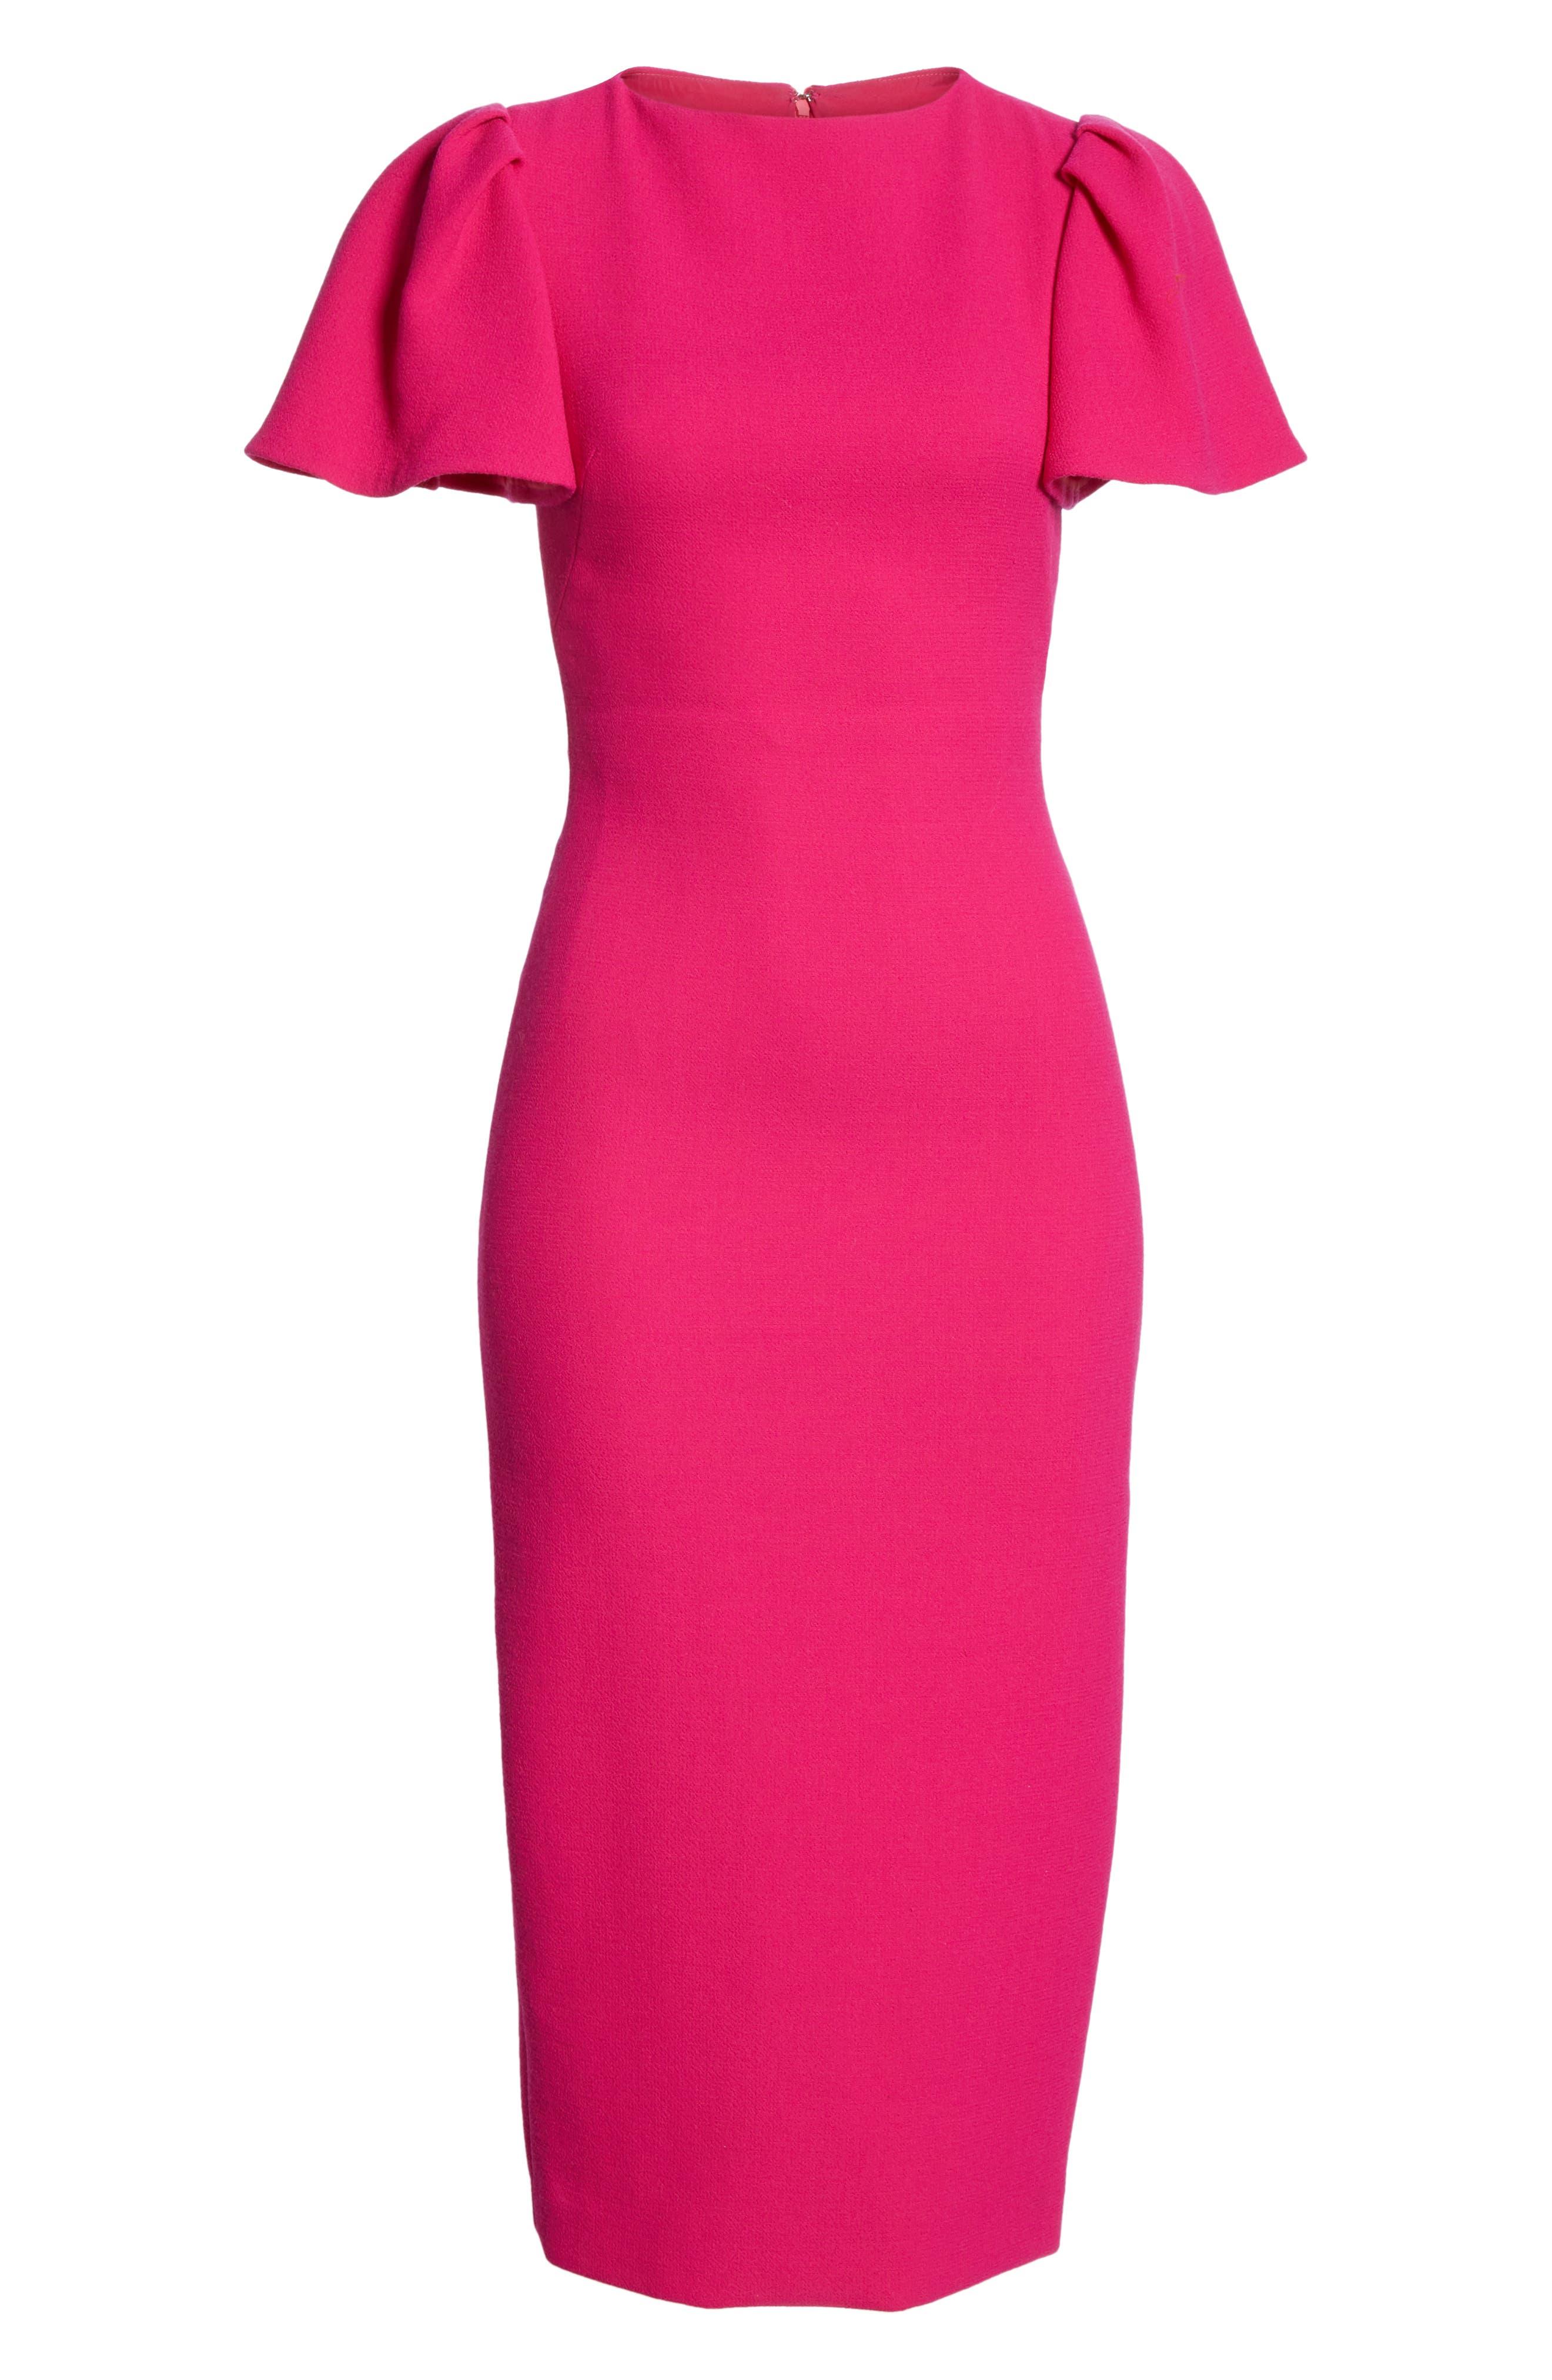 BRANDON MAXWELL, Flutter Sleeve Sheath Dress, Alternate thumbnail 7, color, MAGENTA